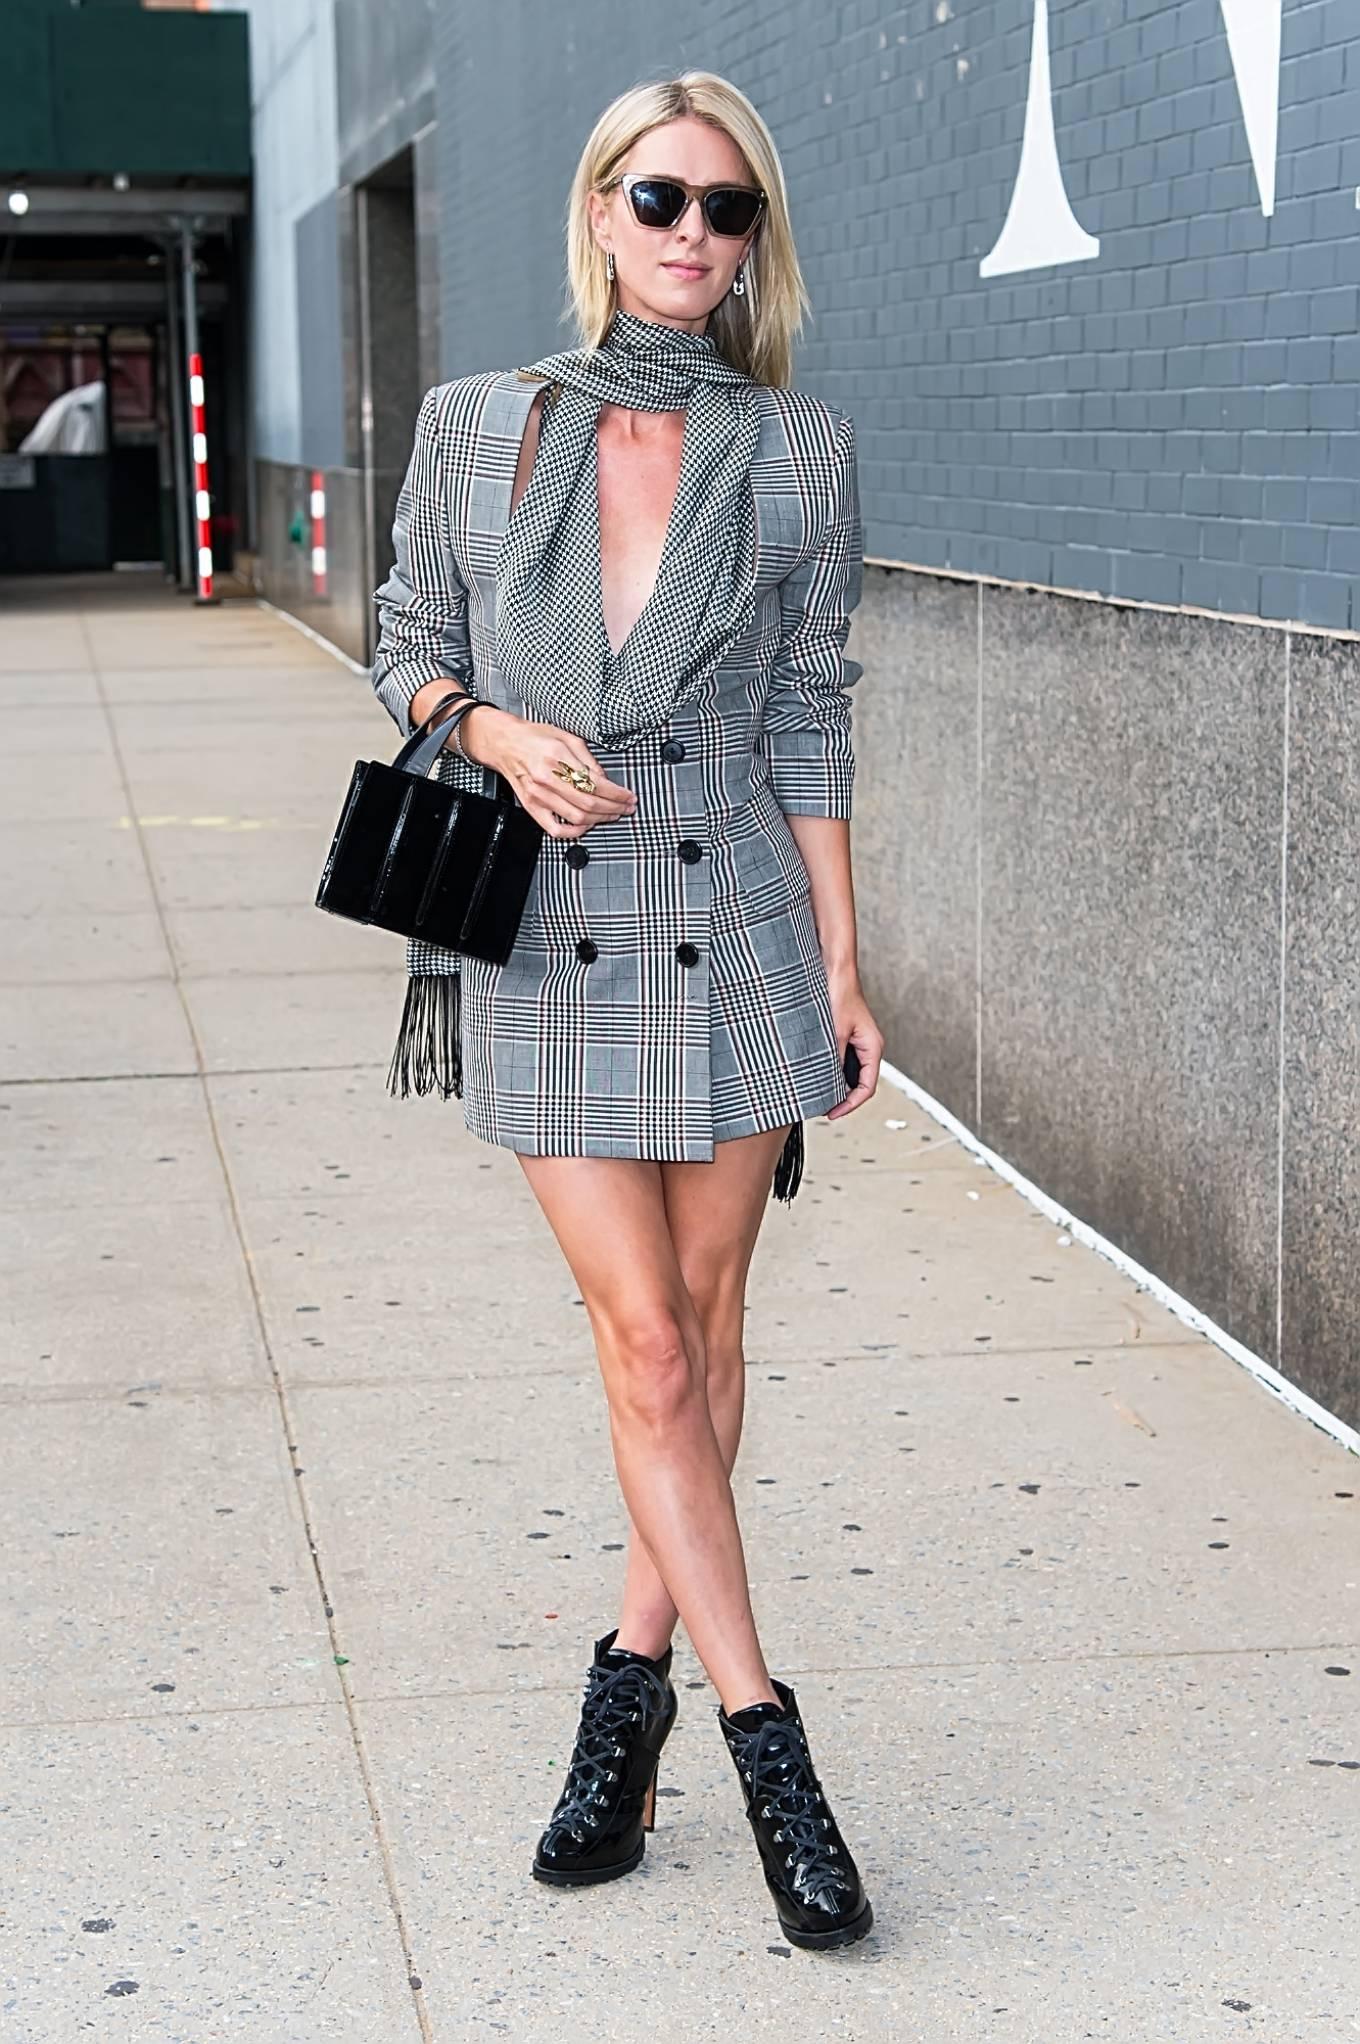 Nicky Hilton 2020 : Nicky Hilton – New York Fashion Week – Monse Fall-Winter 2020 Presentation-11